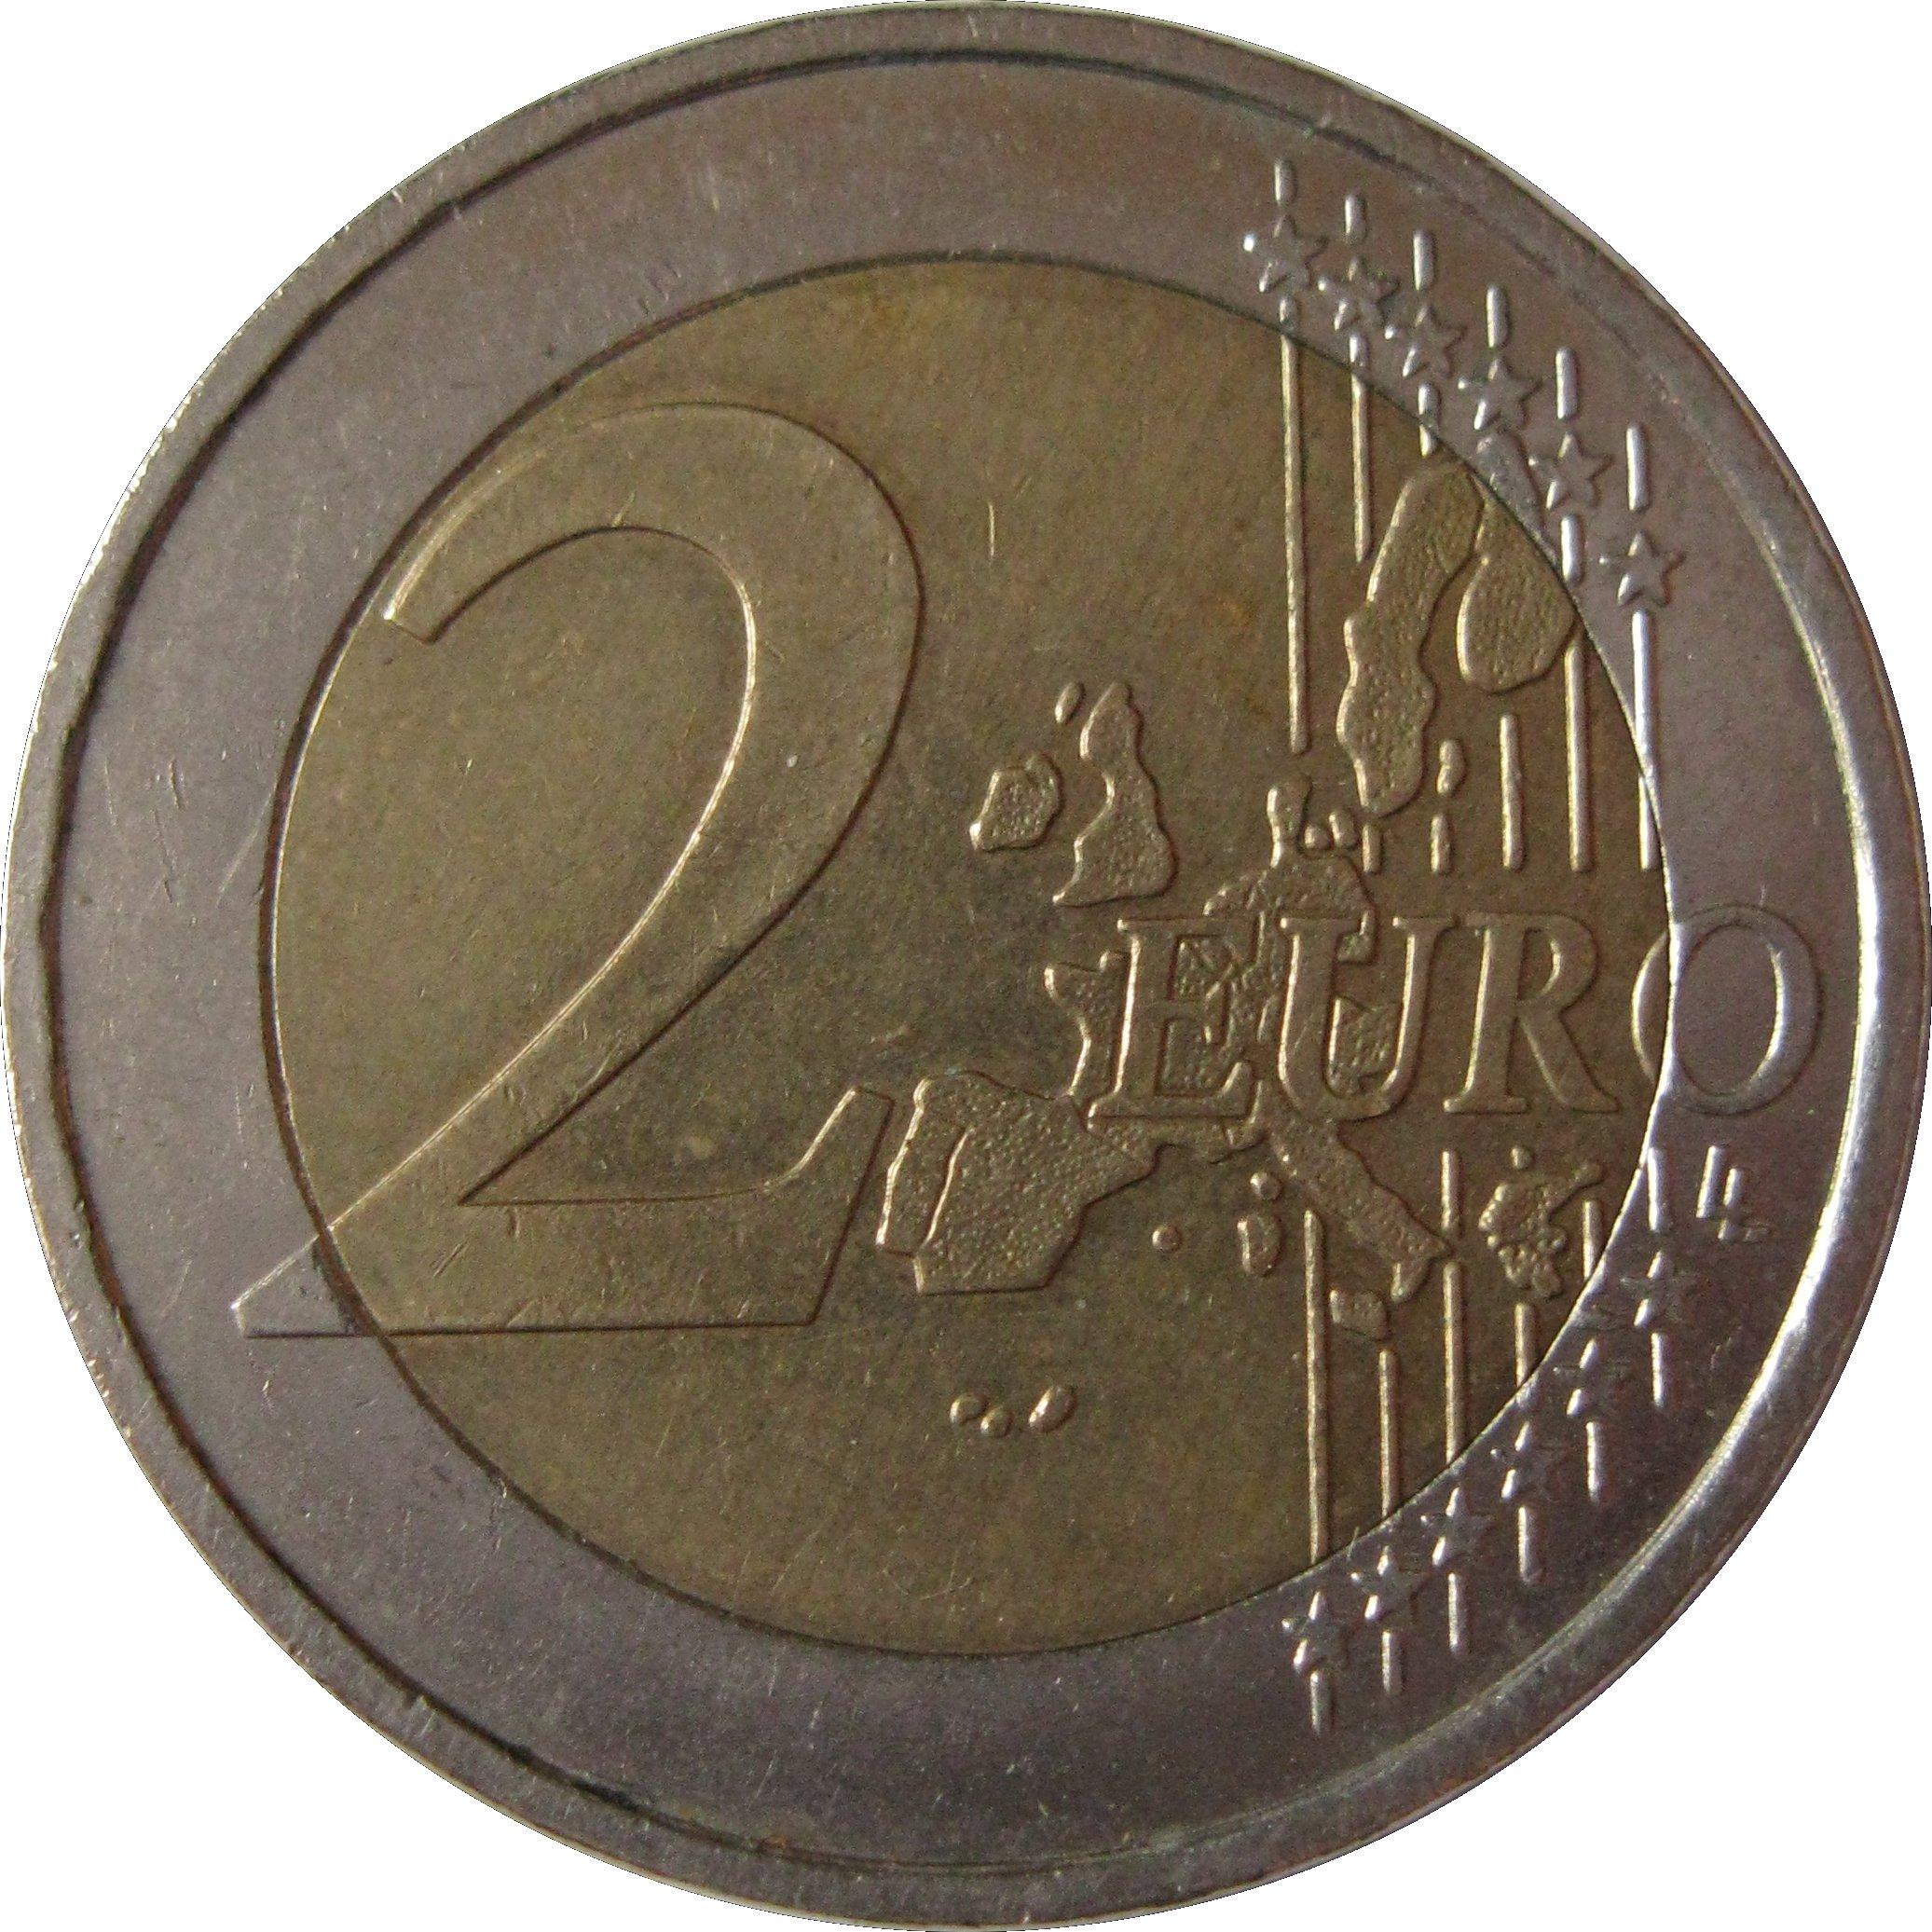 2 euro albert ii belgium luxembourg economic union. Black Bedroom Furniture Sets. Home Design Ideas